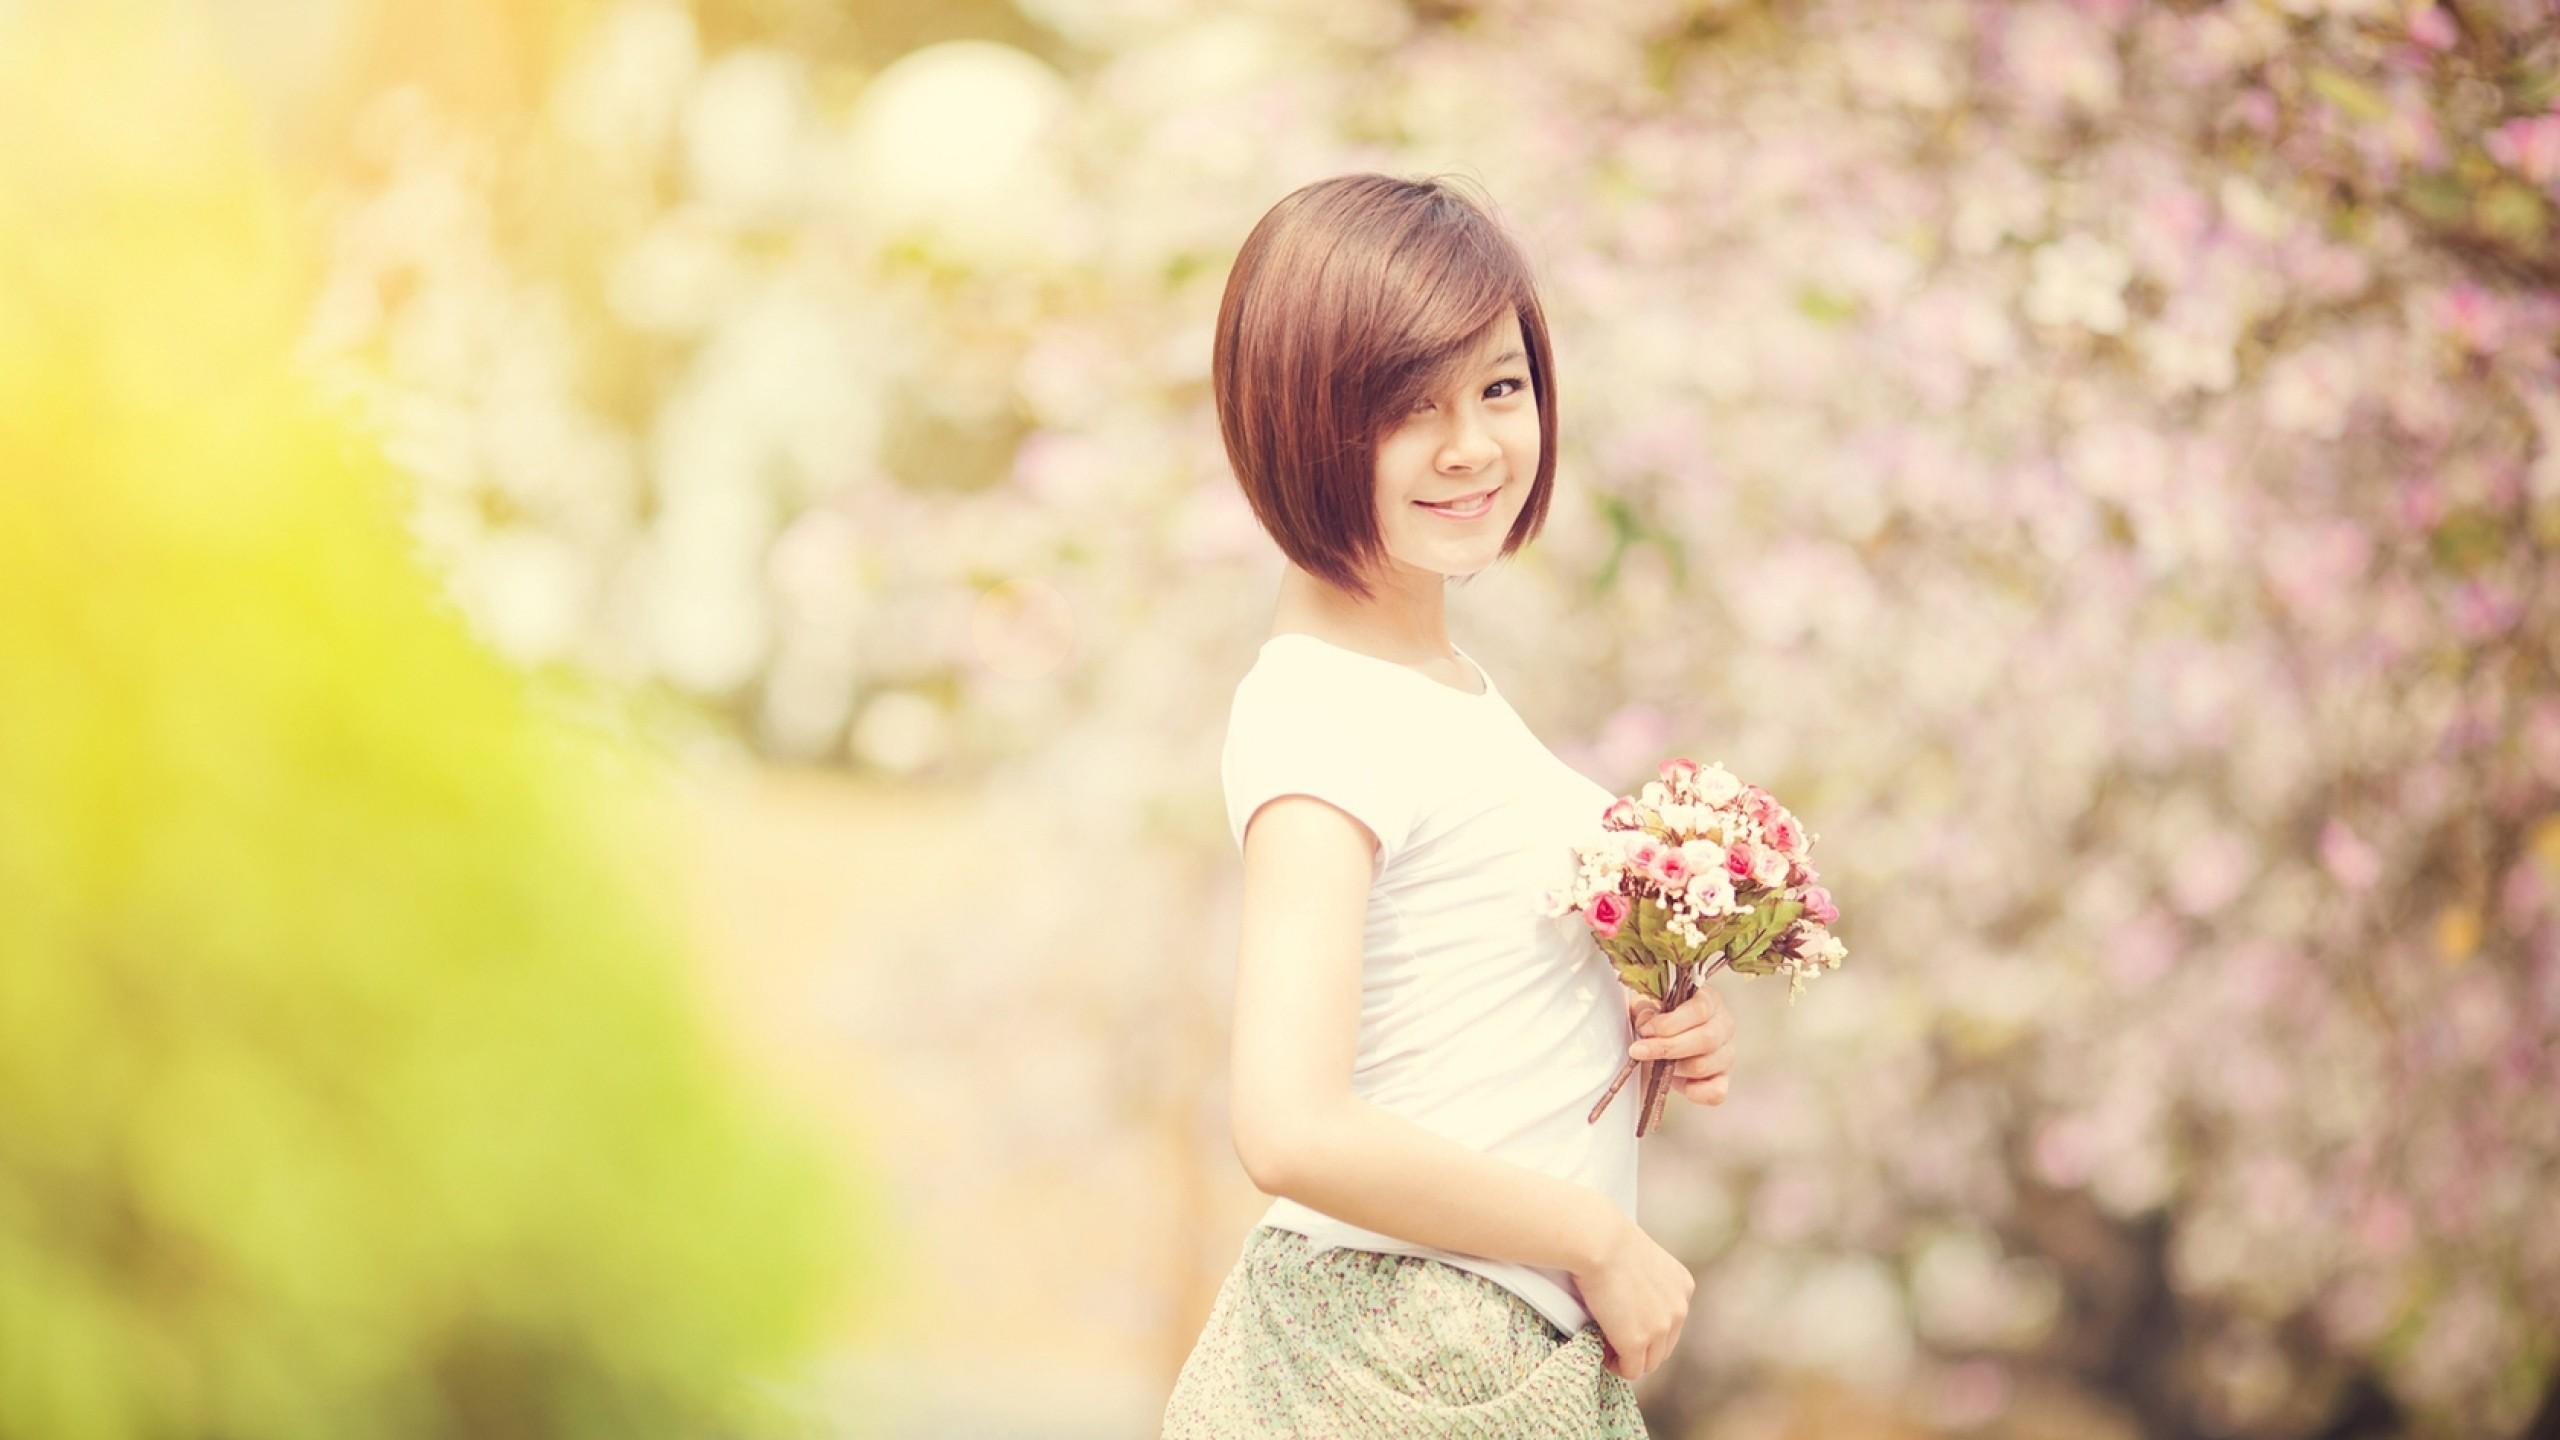 Preview wallpaper spring, girl, asian, flashing, bokeh, smile, flowers  2560×1440